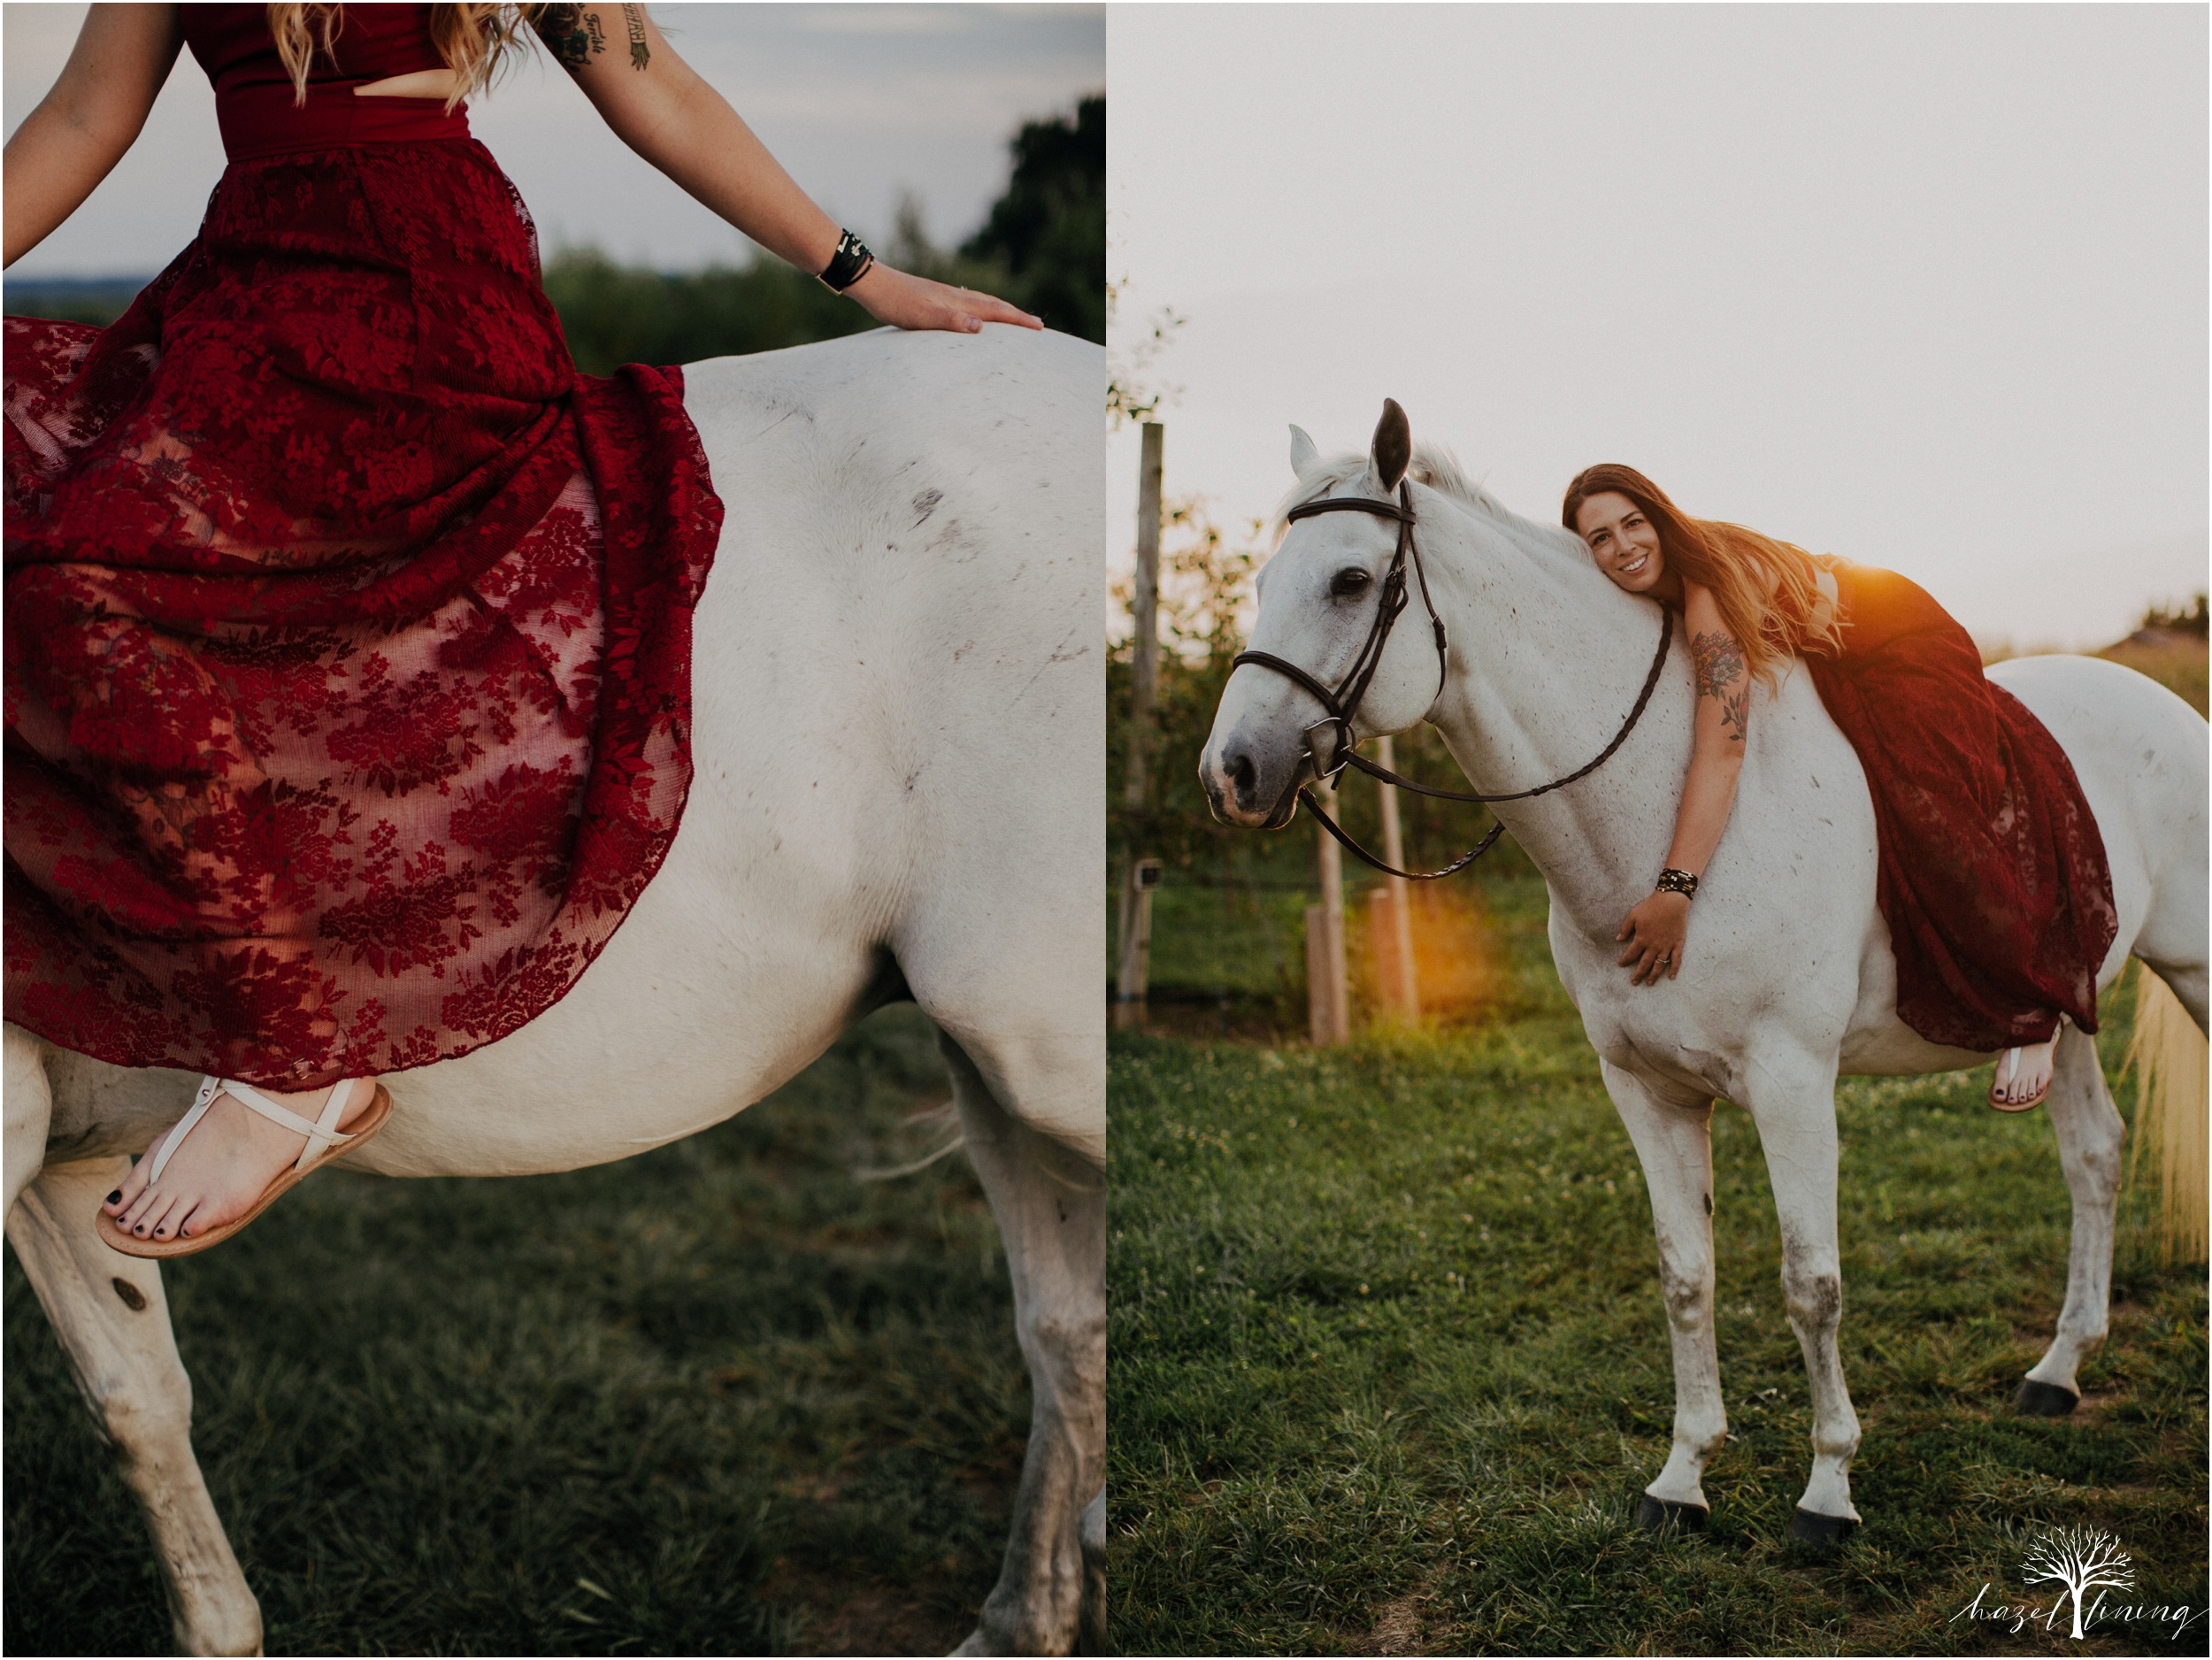 taylor-adams-and-horse-delaware-valley-university-delval-summer-equestrian-portrait-session-hazel-lining-photography-destination-elopement-wedding-engagement-photography_0071.jpg